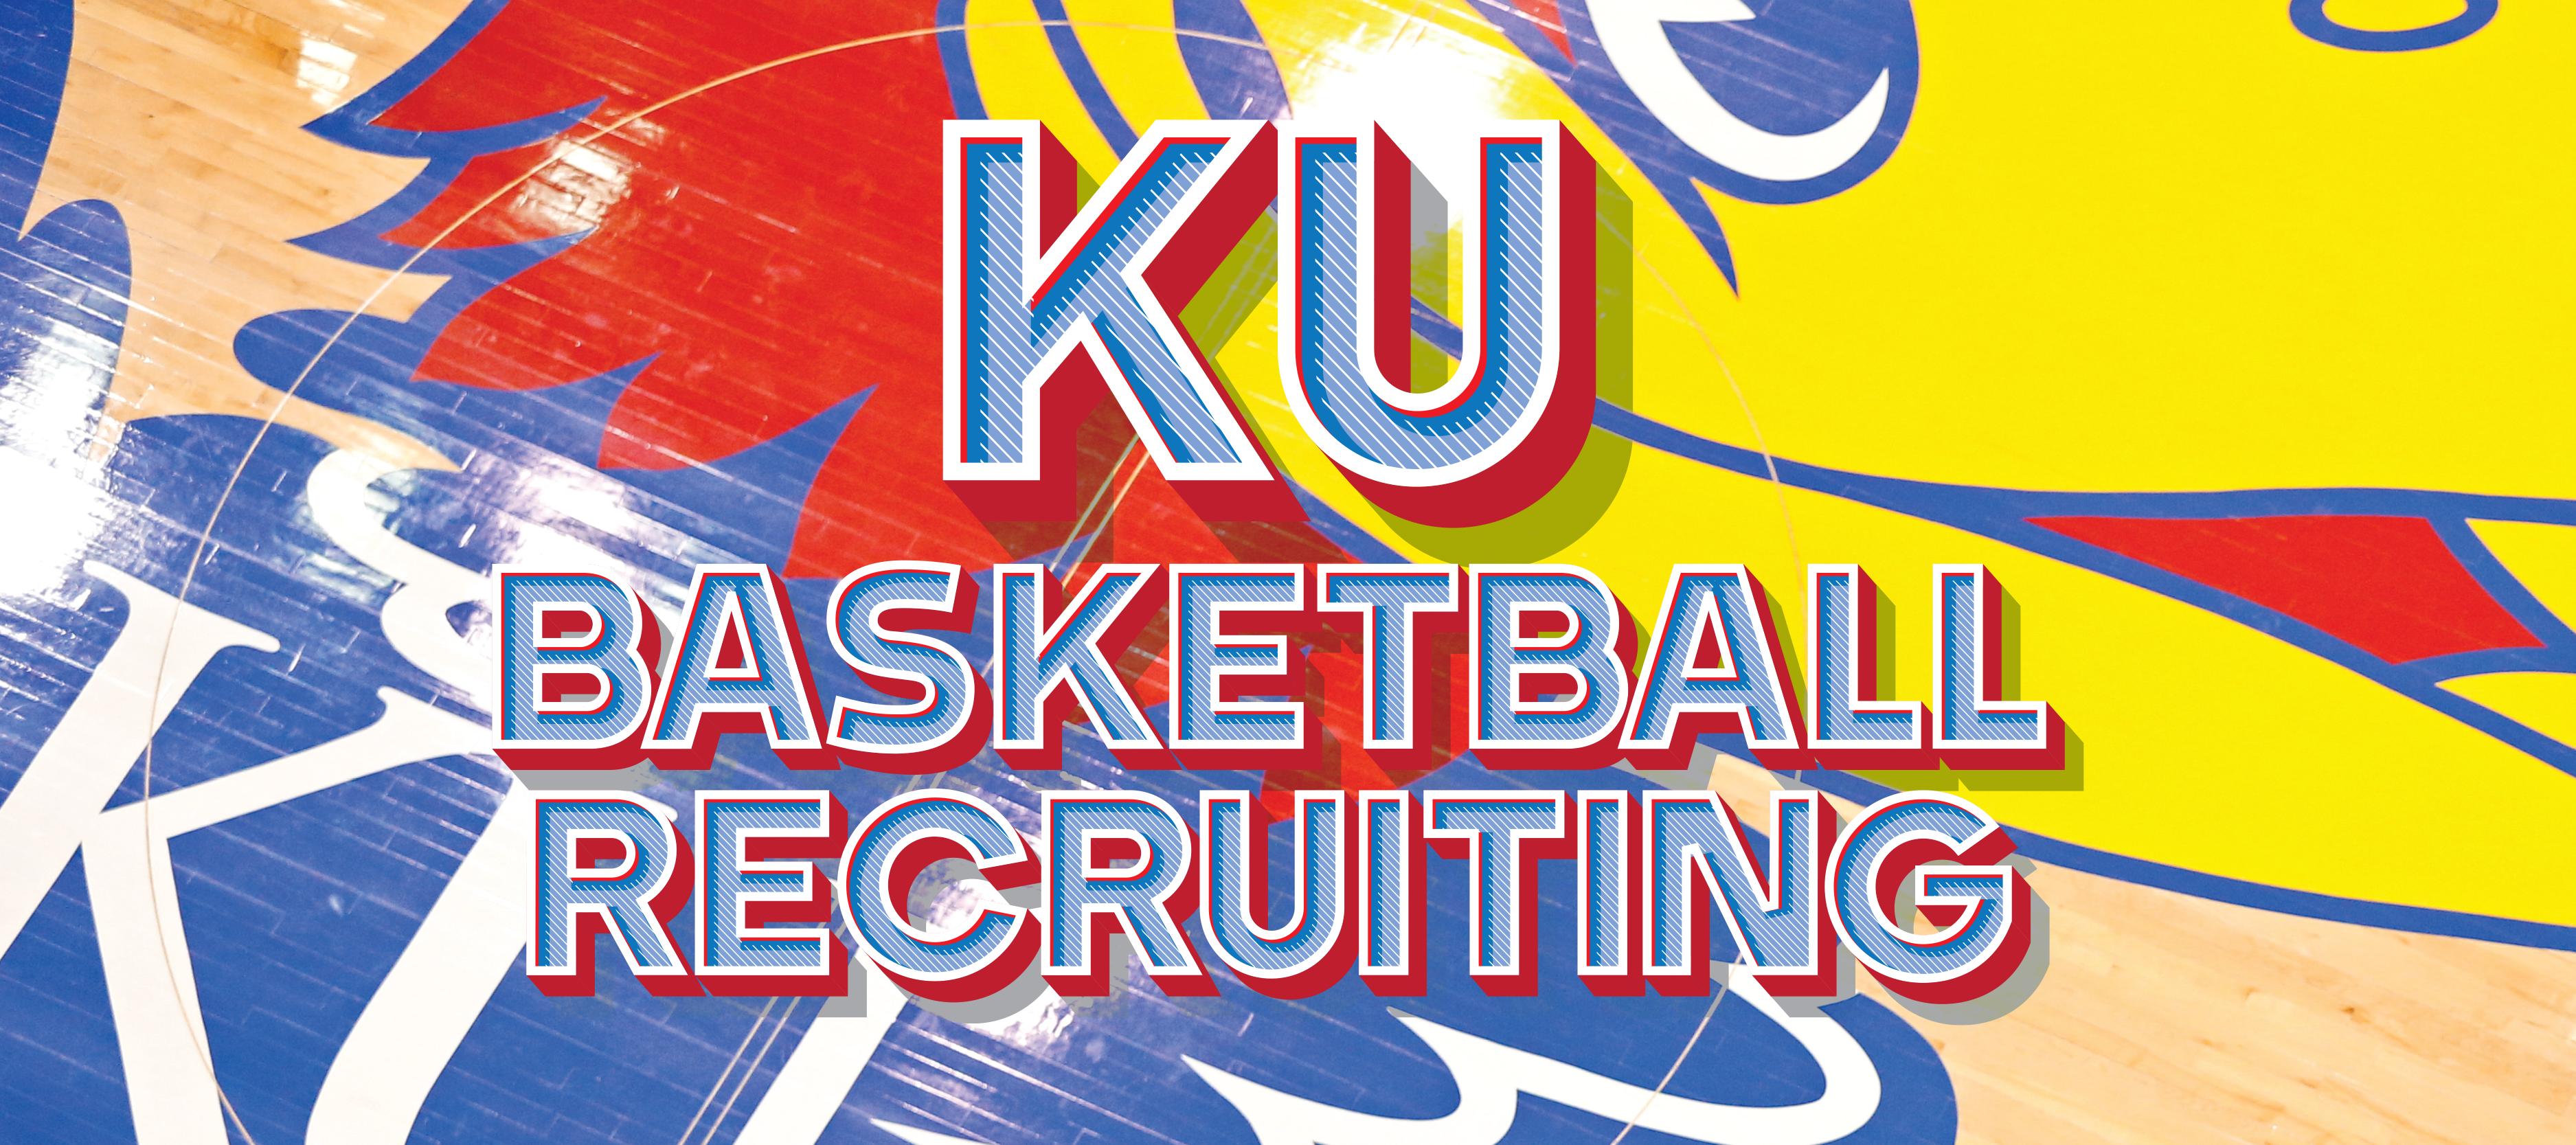 Basketballrecruiting_dec17_2015